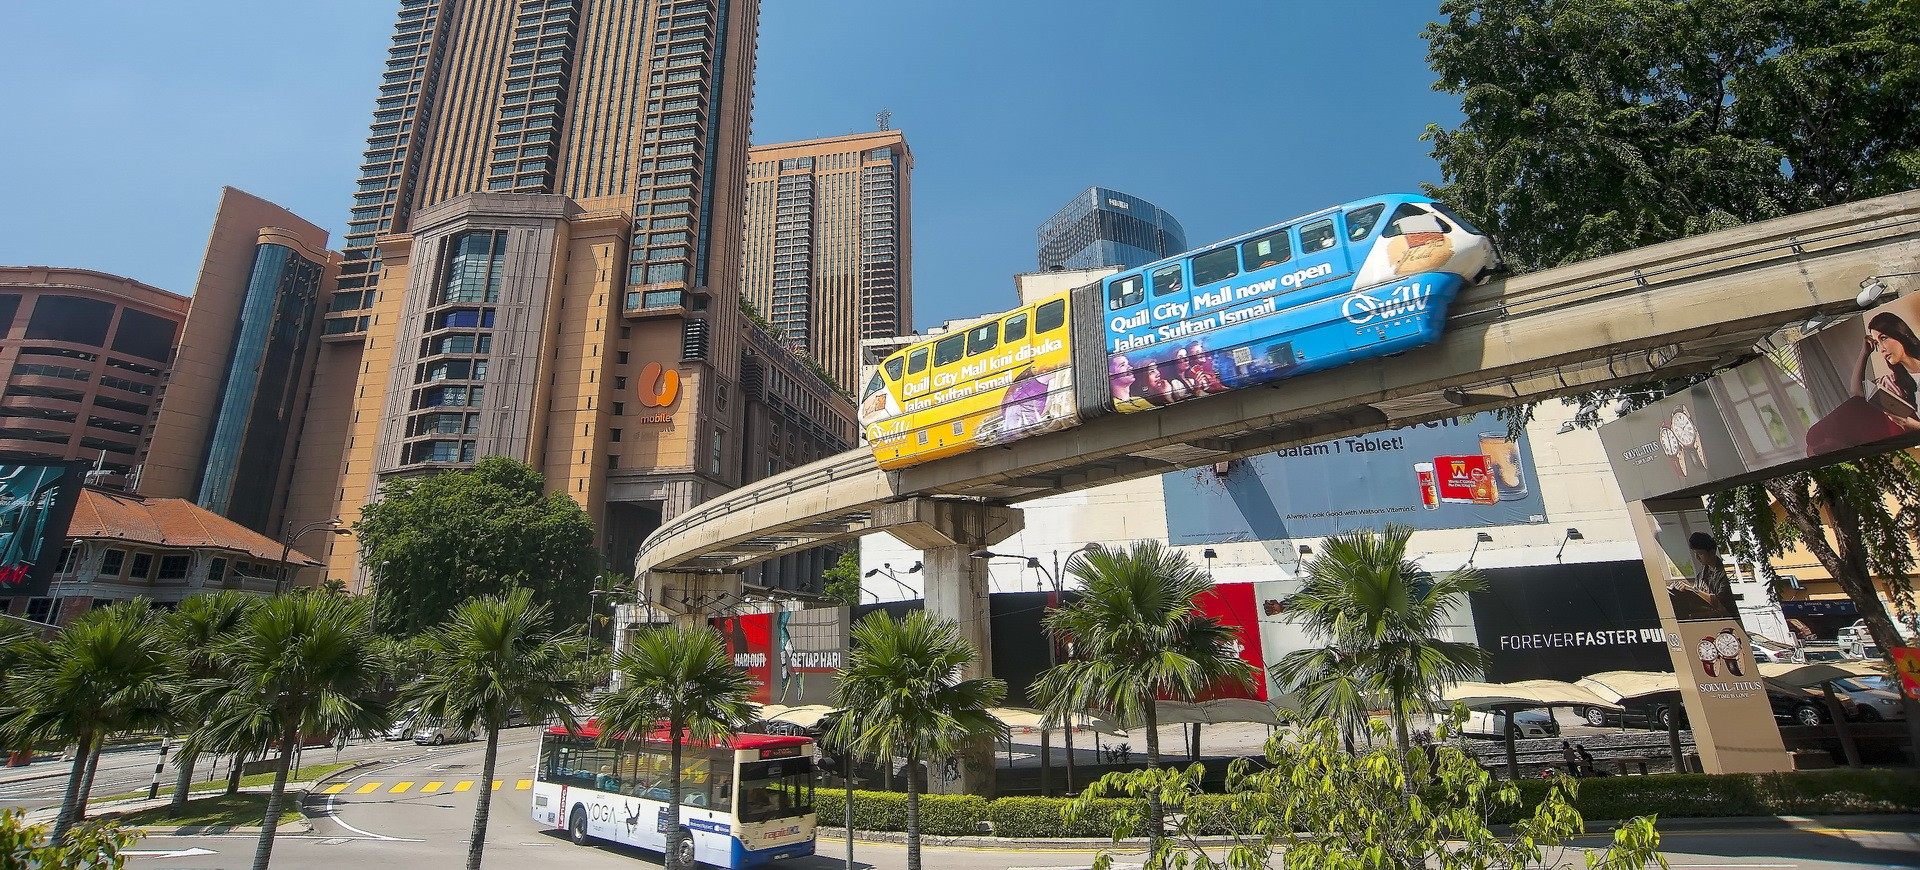 Malaisie Kuala Lumpur Monorail